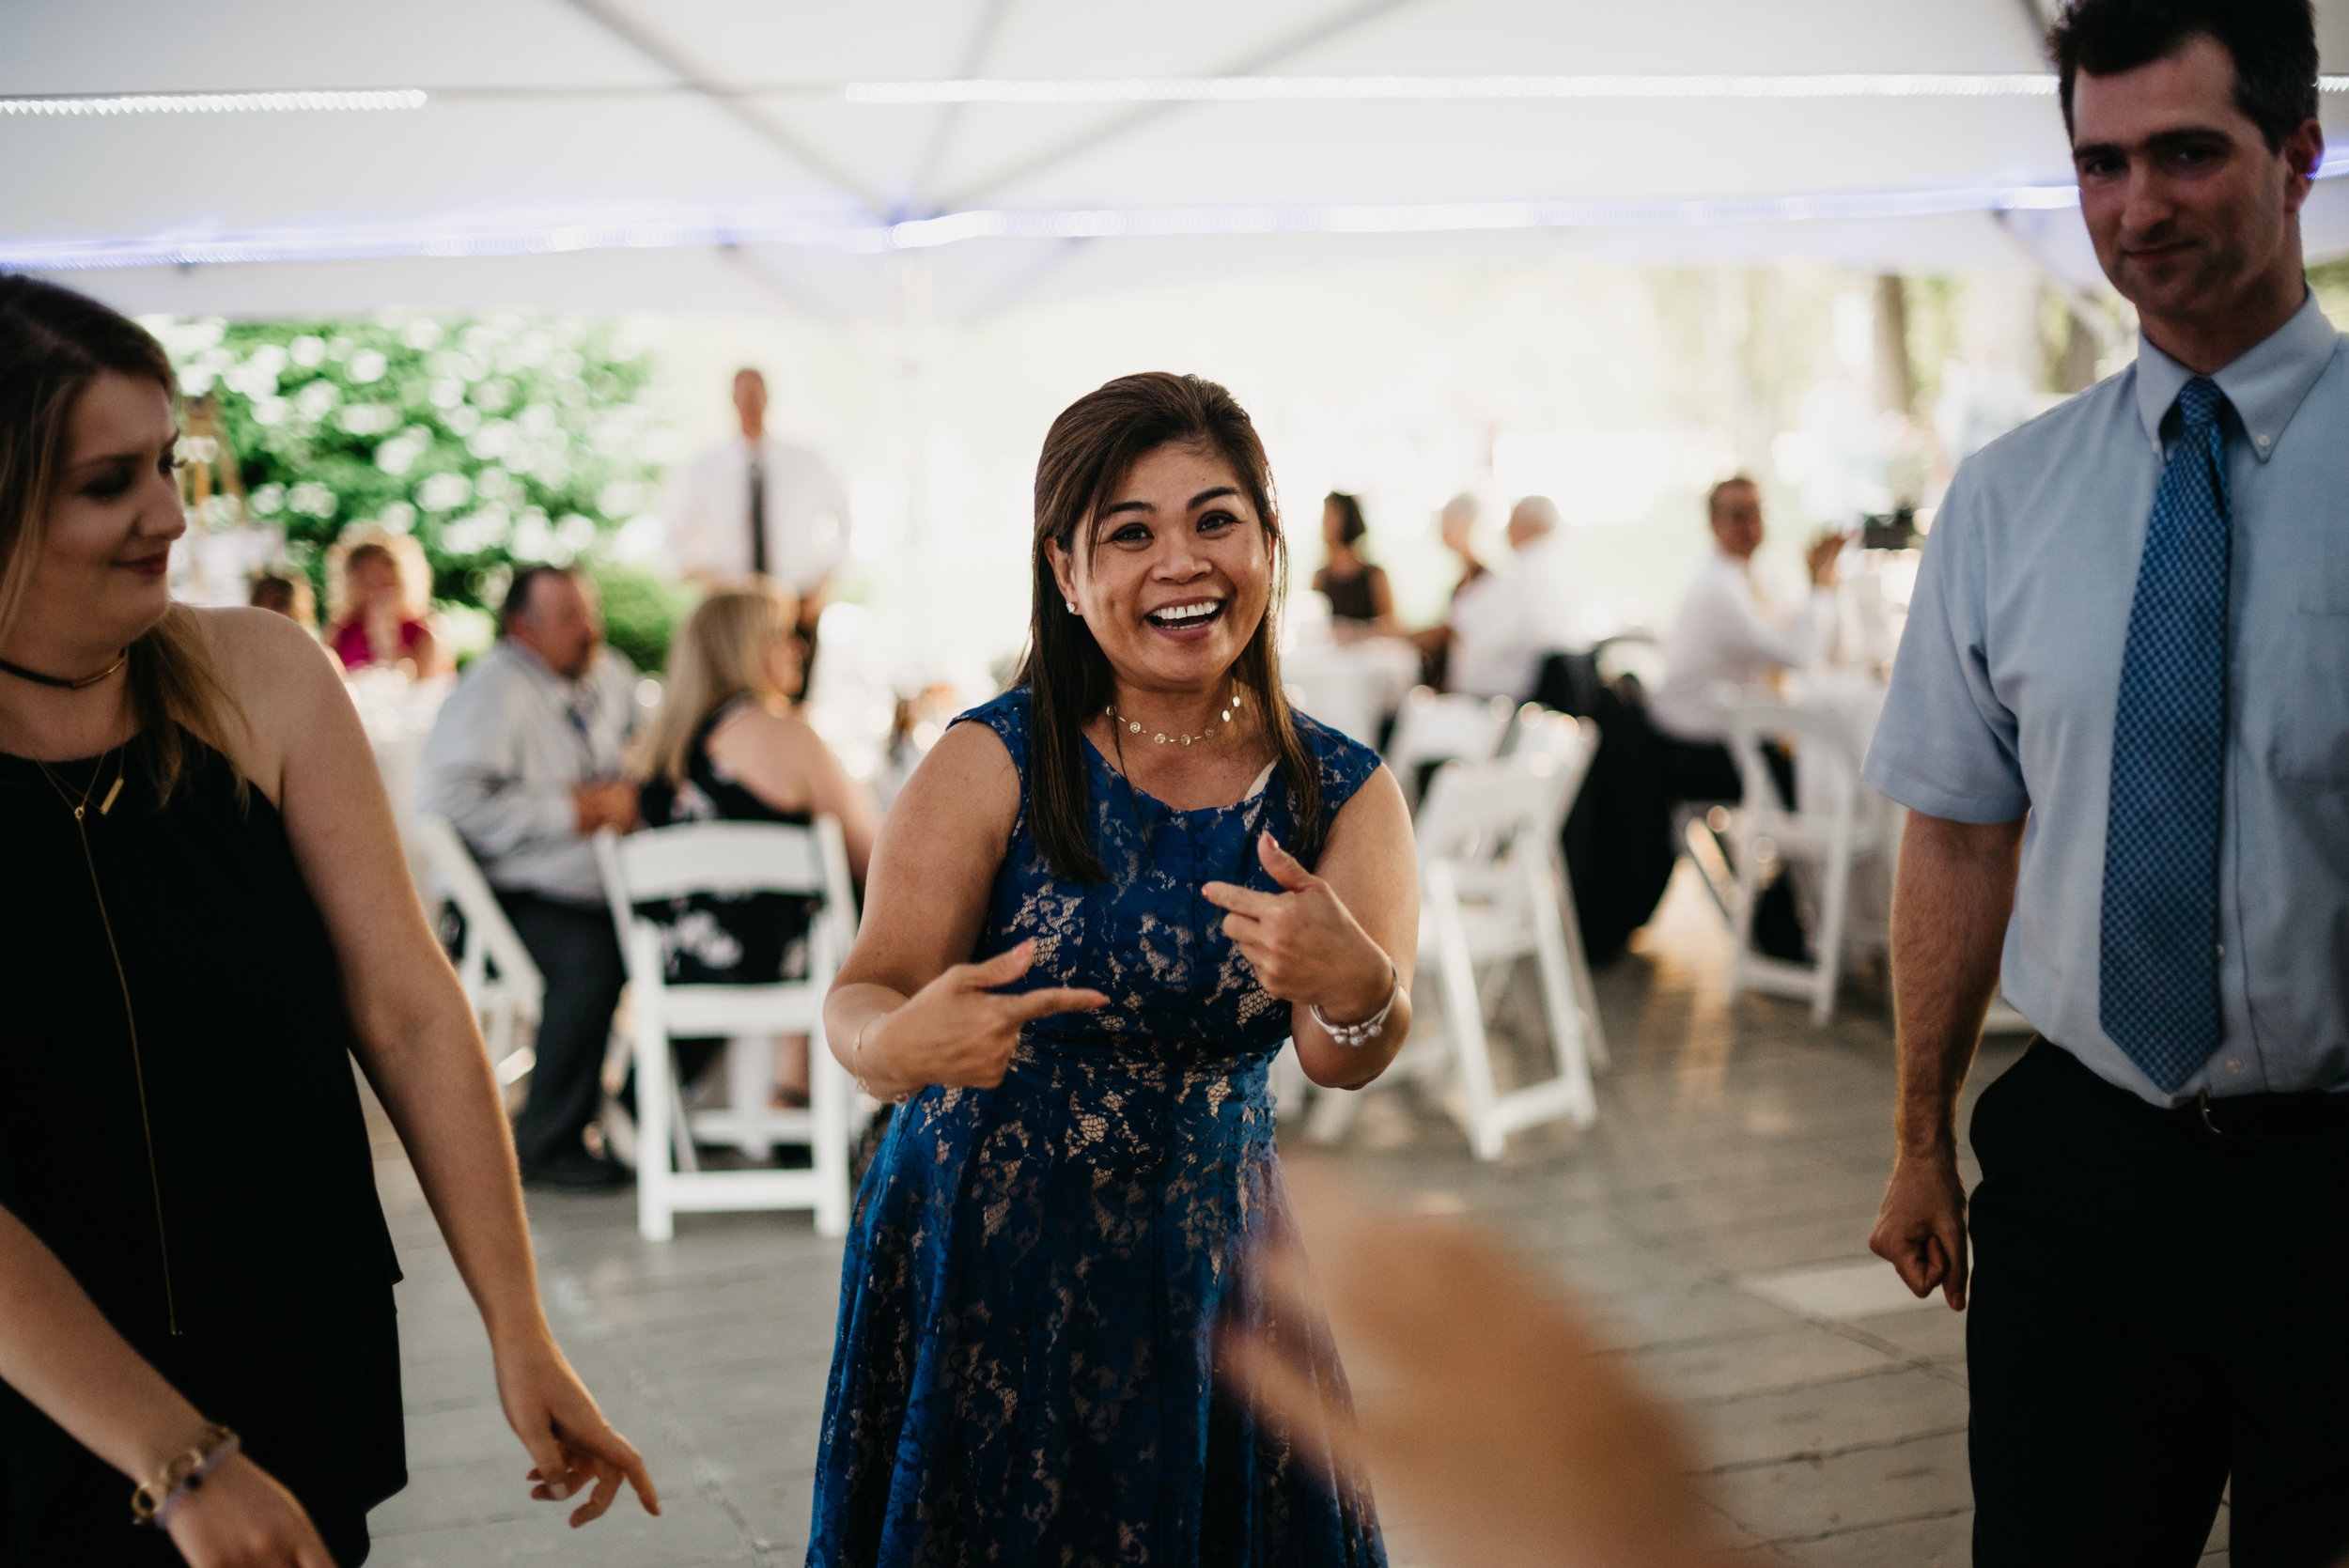 Barch-Massachusetts-Lakeside Tent Wedding-Western Massachusetts Wedding Photographer-03441.jpg